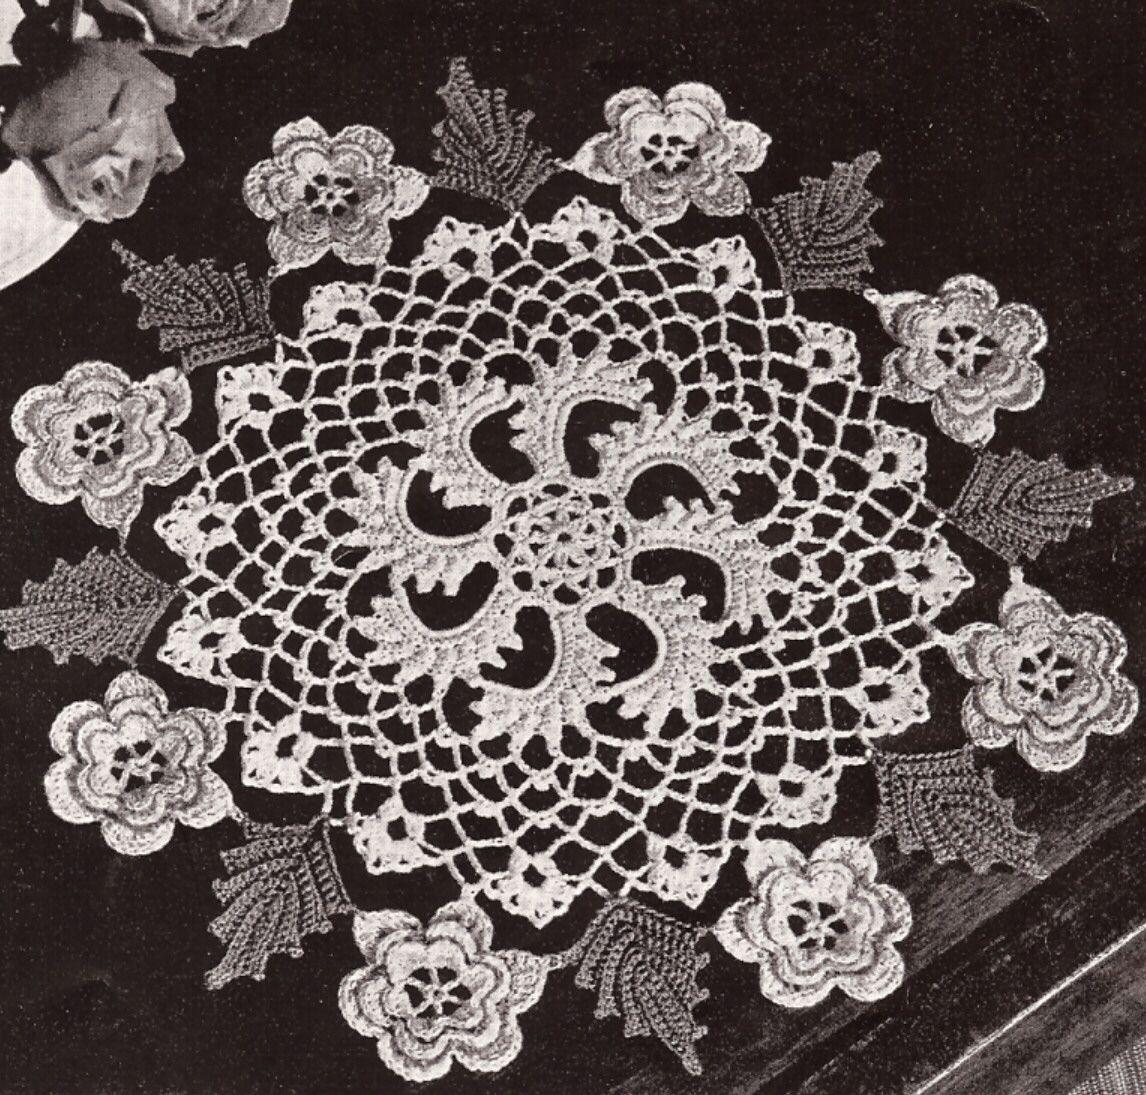 Doily Patterns Free Vintage Crochet - dinocro.info